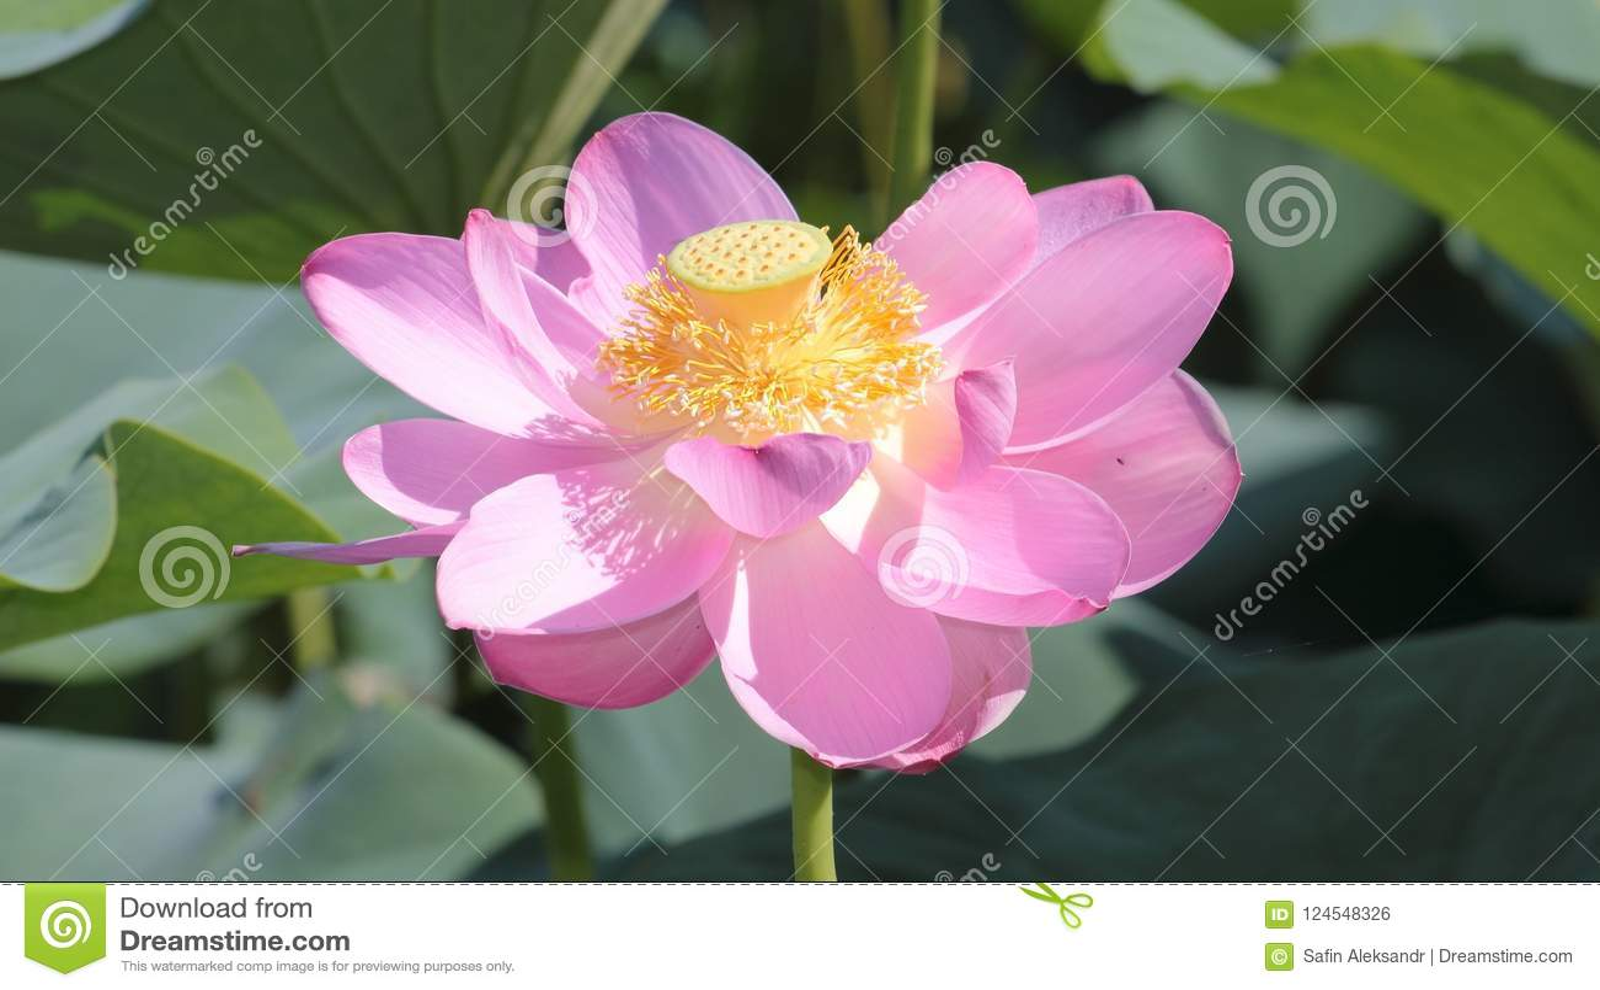 Big lotus flower on green leaves background stock photo image of download big lotus flower on green leaves background stock photo image of green large mightylinksfo